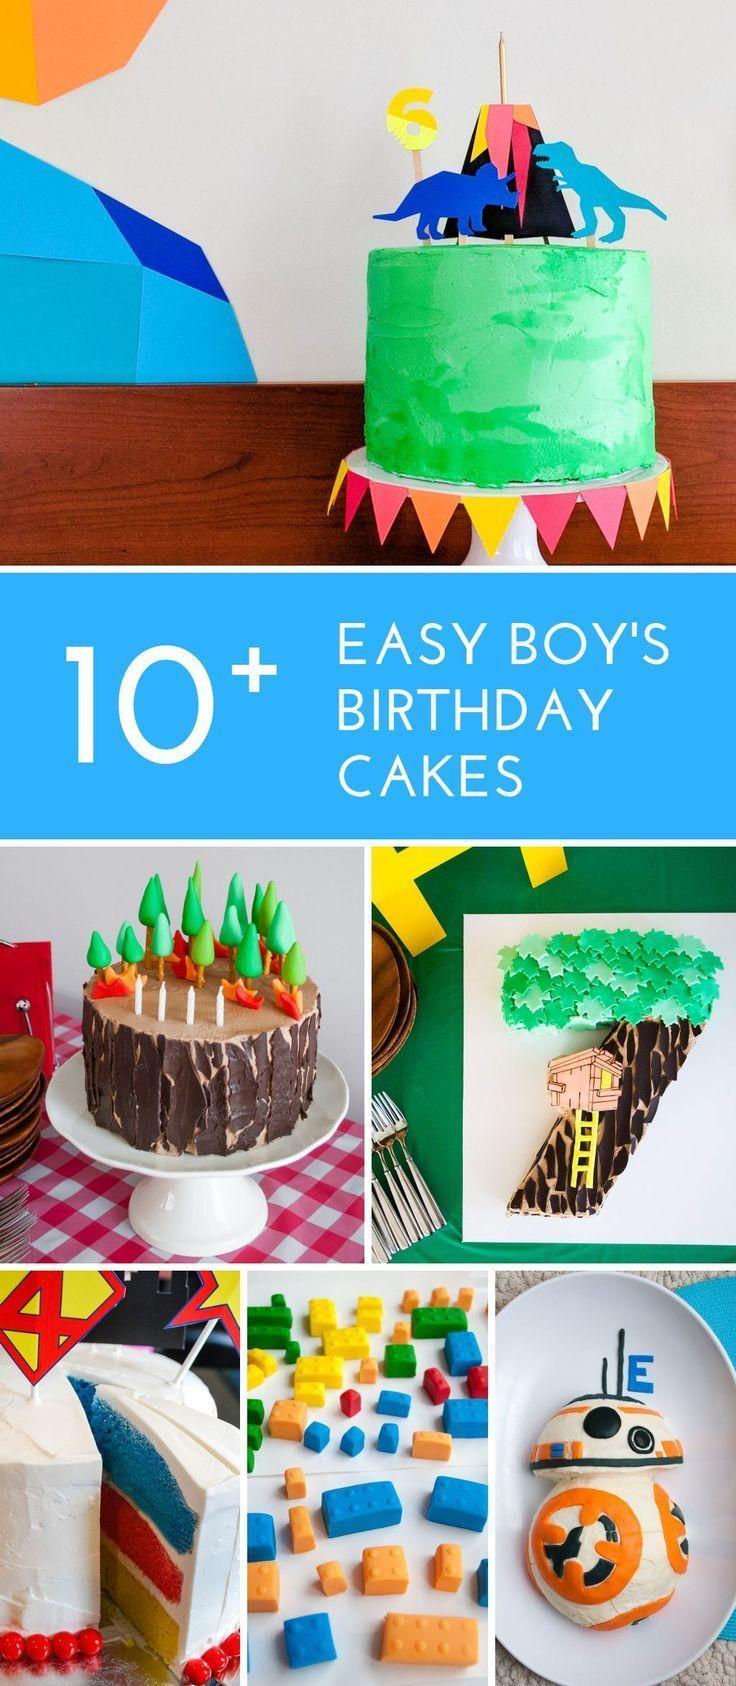 Easy Boys Birthday Cakes See These Simple Diy Boy Cake Ideas For